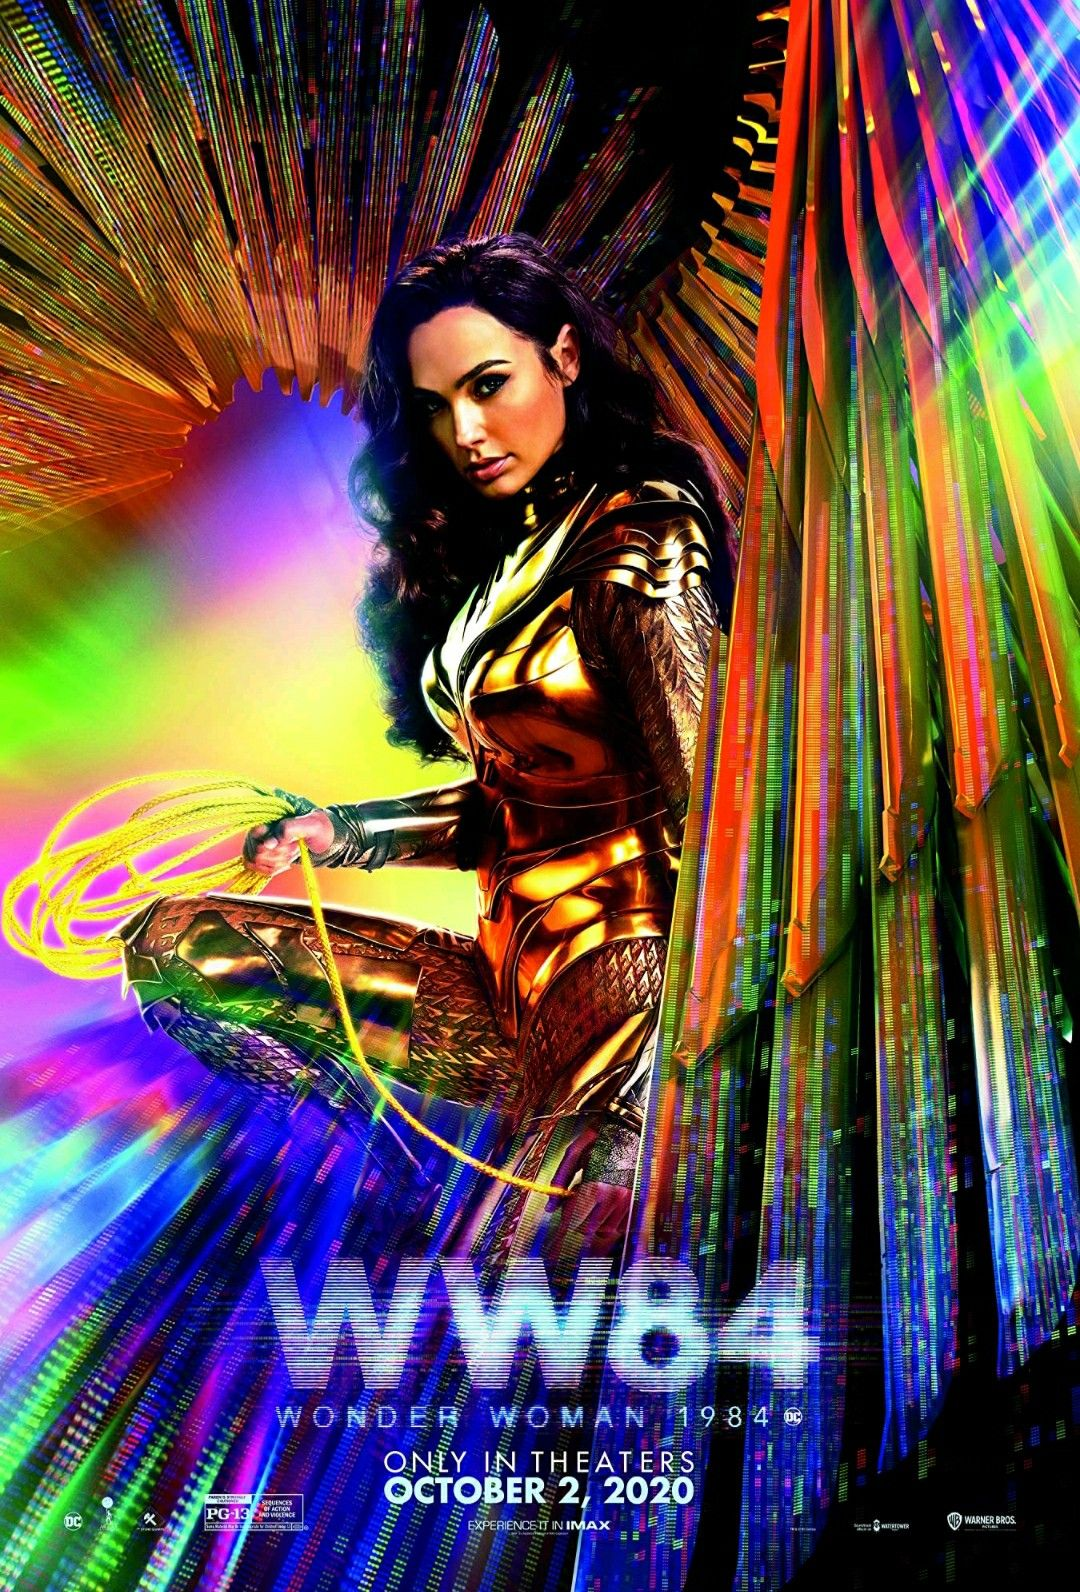 Wonder Woman 1984 In 2020 Wonder Woman Wonder Fantasy Movies